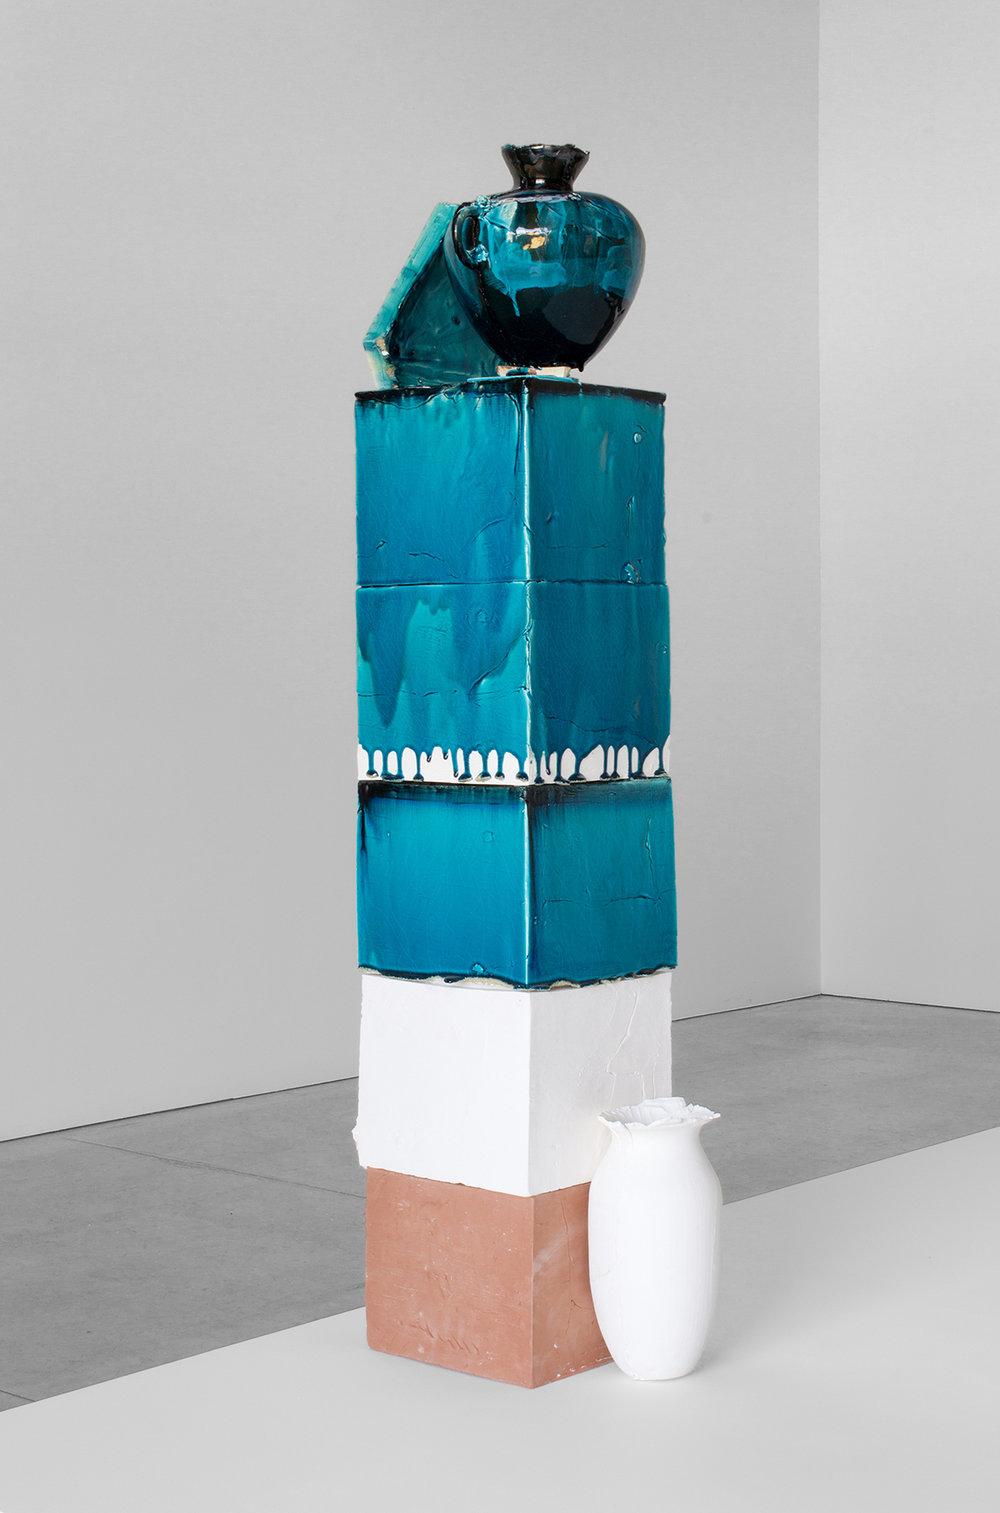 Nicole Cherubini  STELLA,  2016 Earthenware, terra-cotta, glaze, sculpt, pc-II, ink, kiln furniture 68.5 x 18 x 20 in.